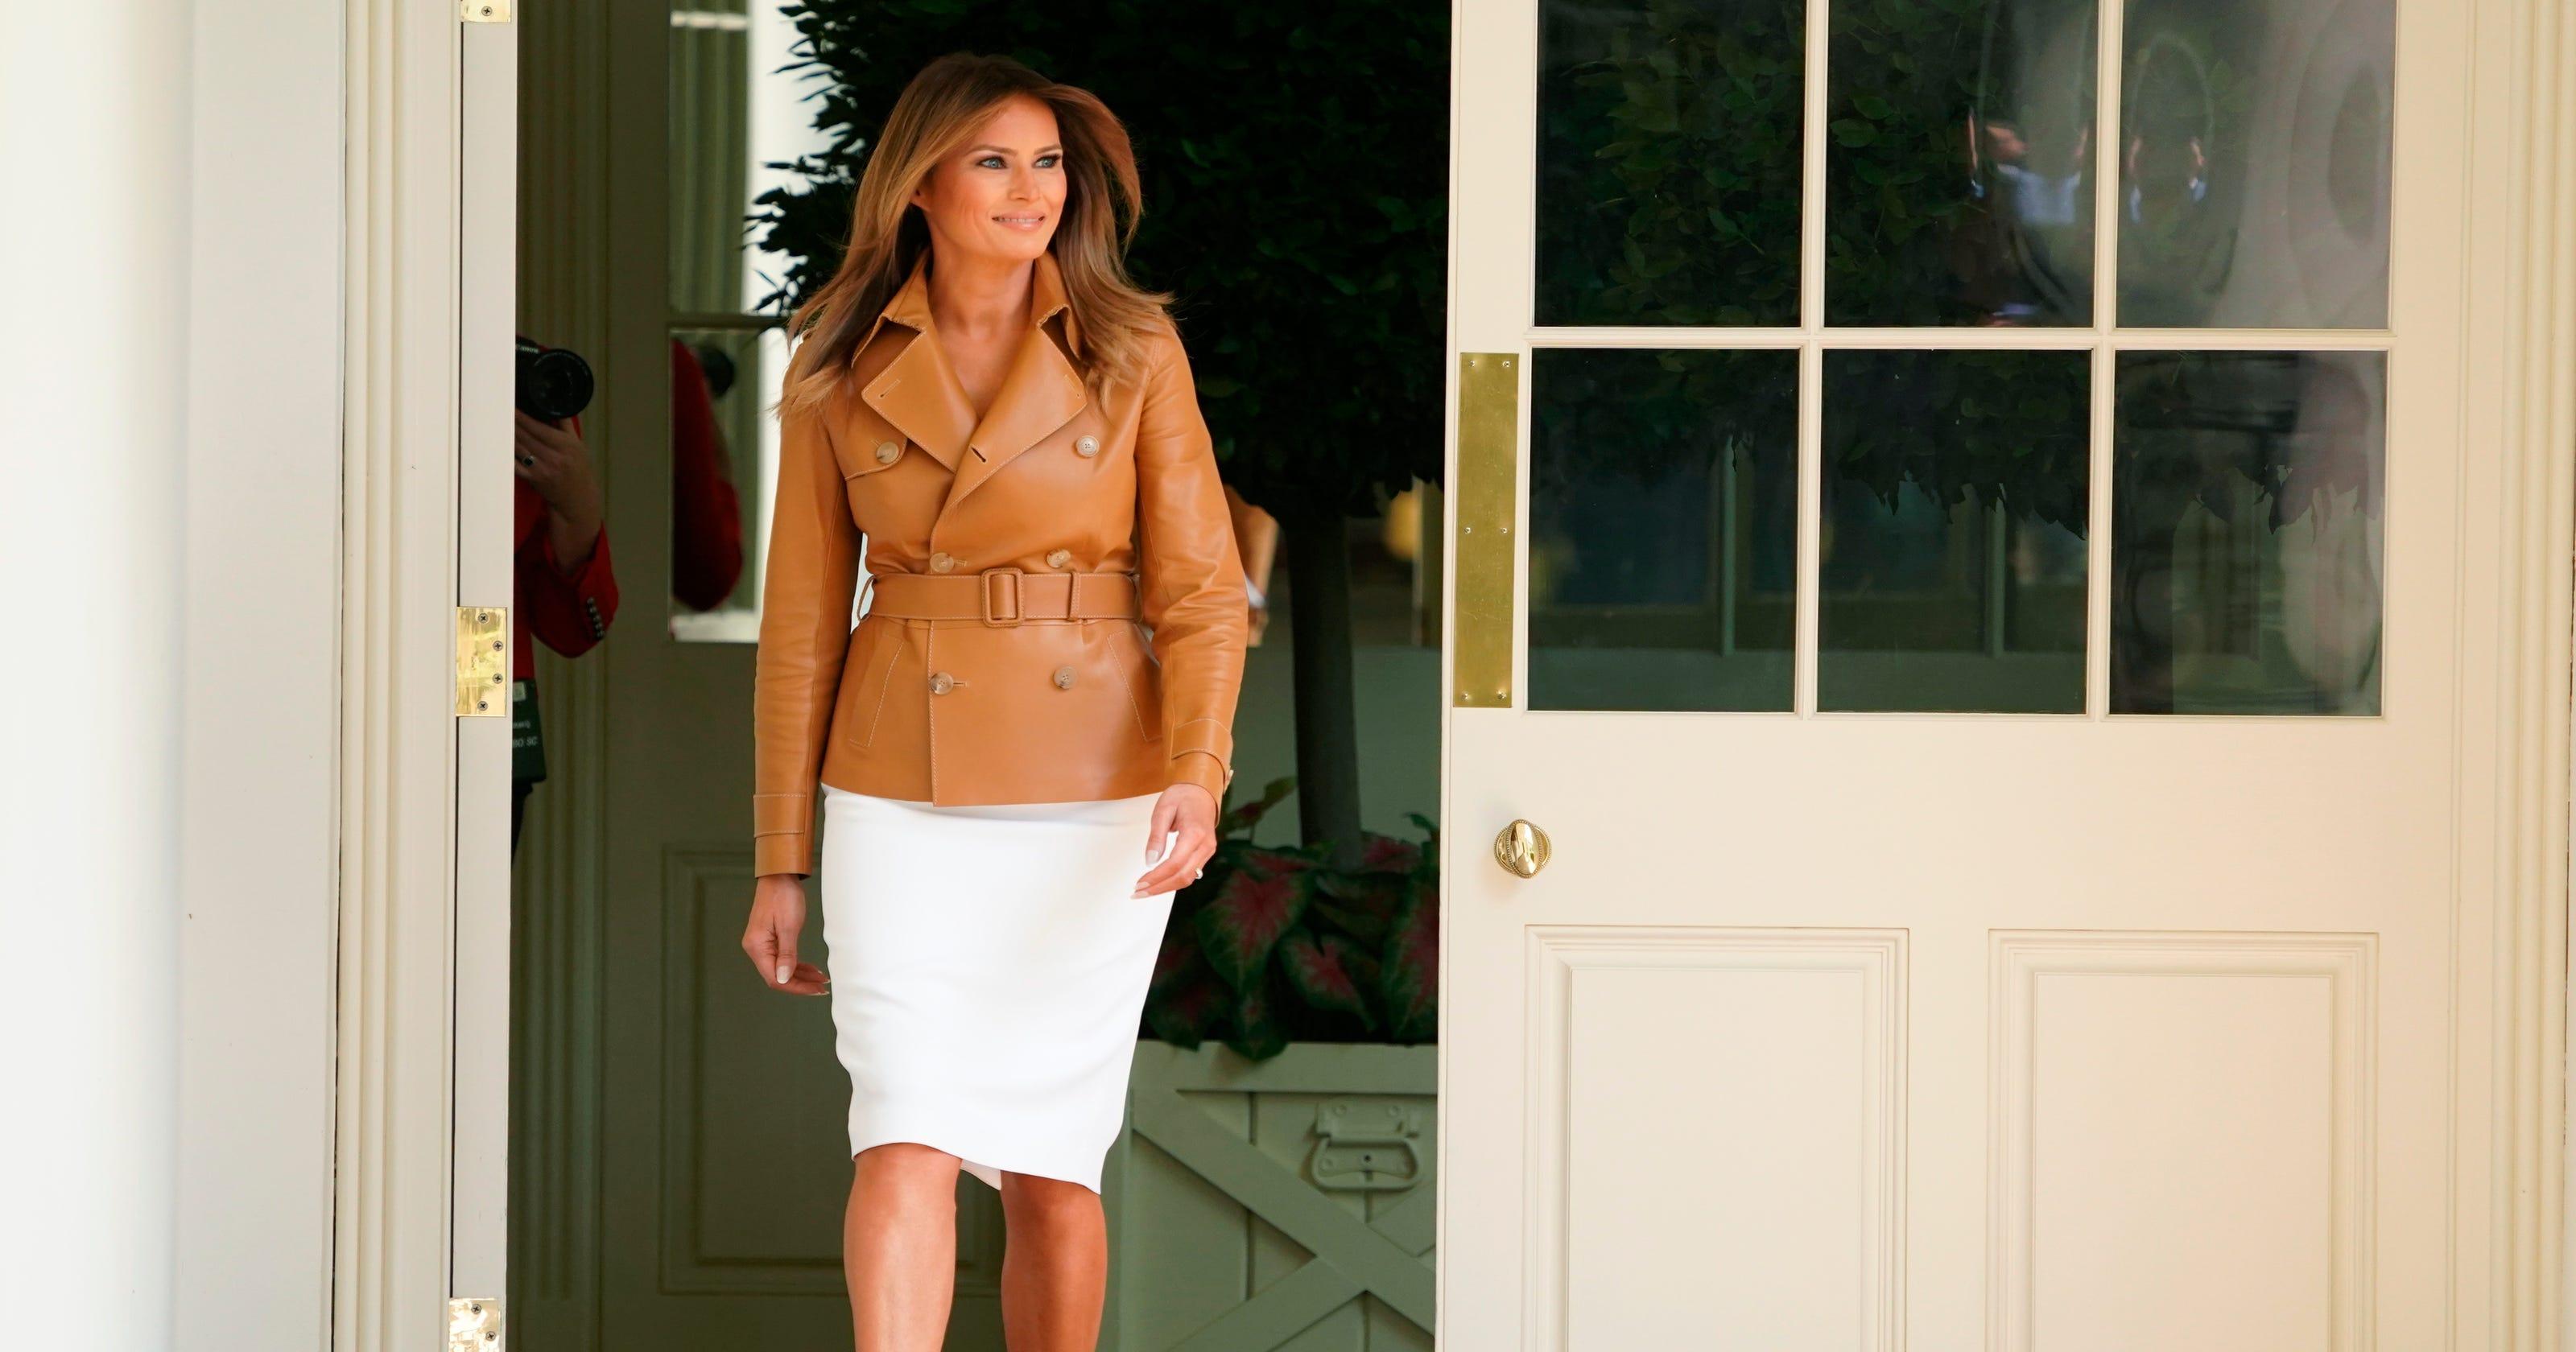 Melania Trump breaks fashion